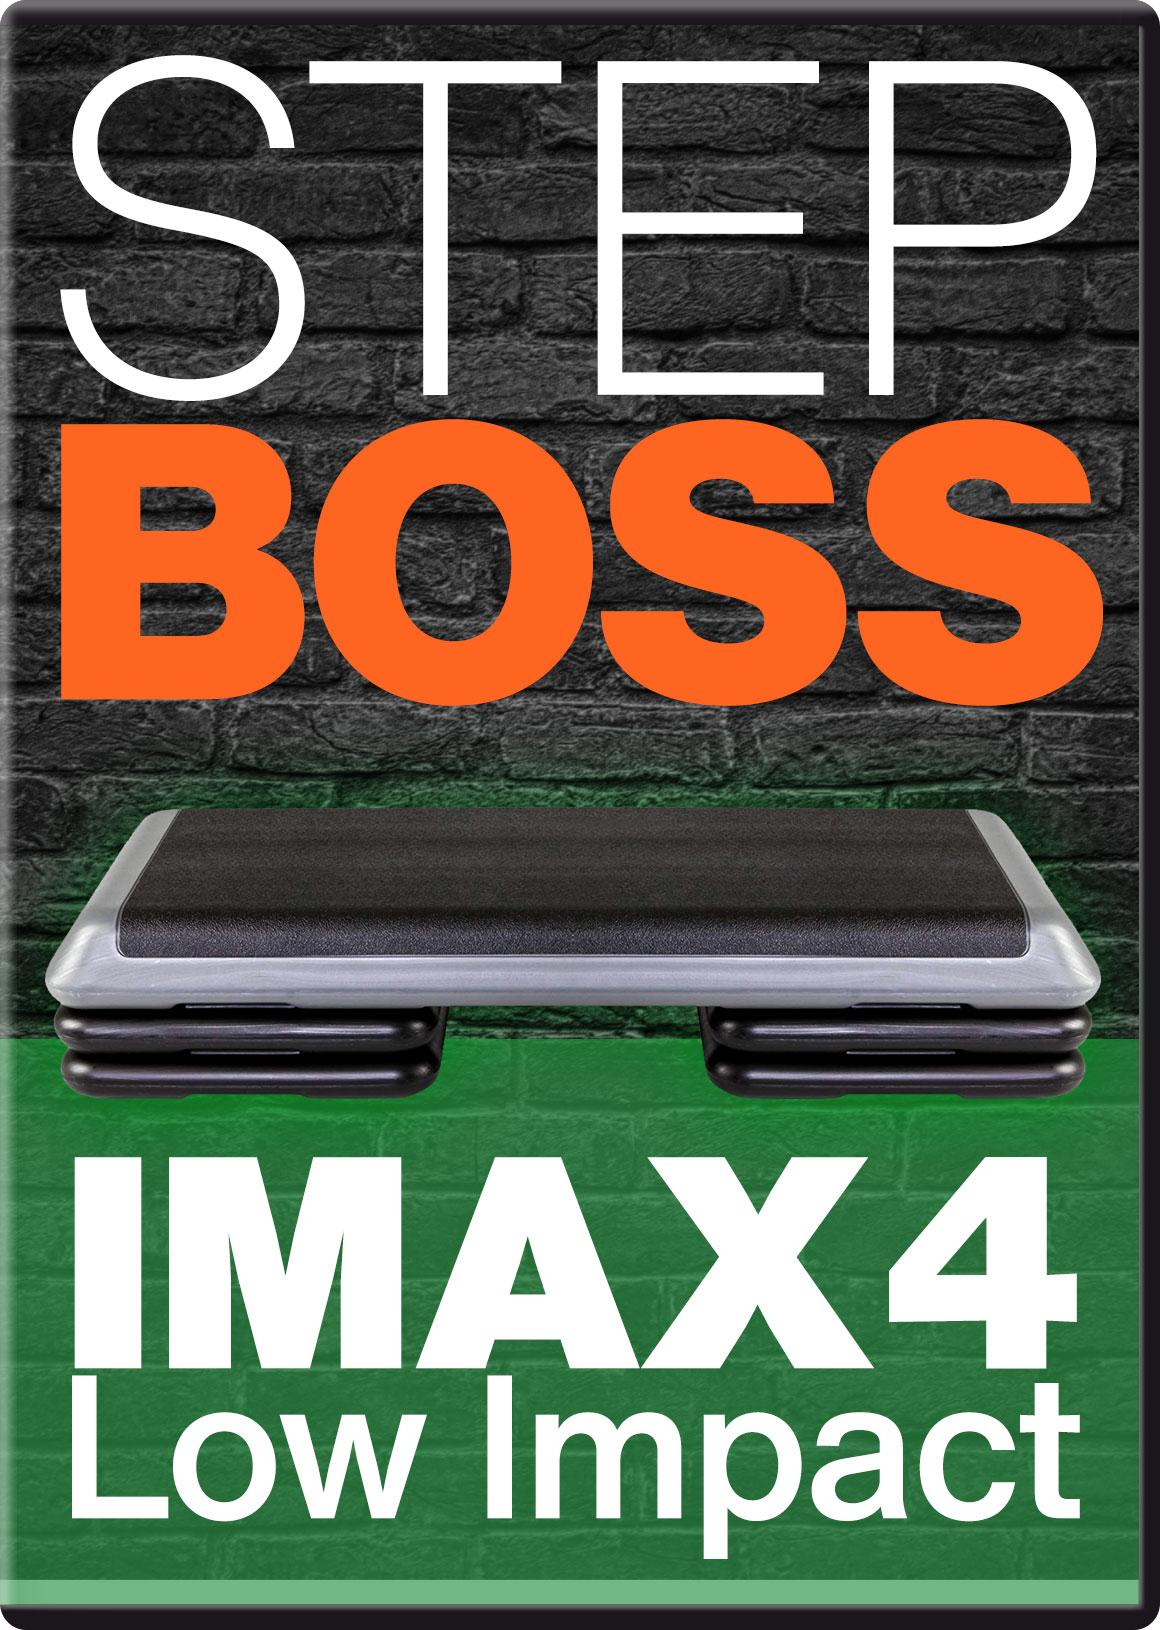 IMAX 4 DVD ICON